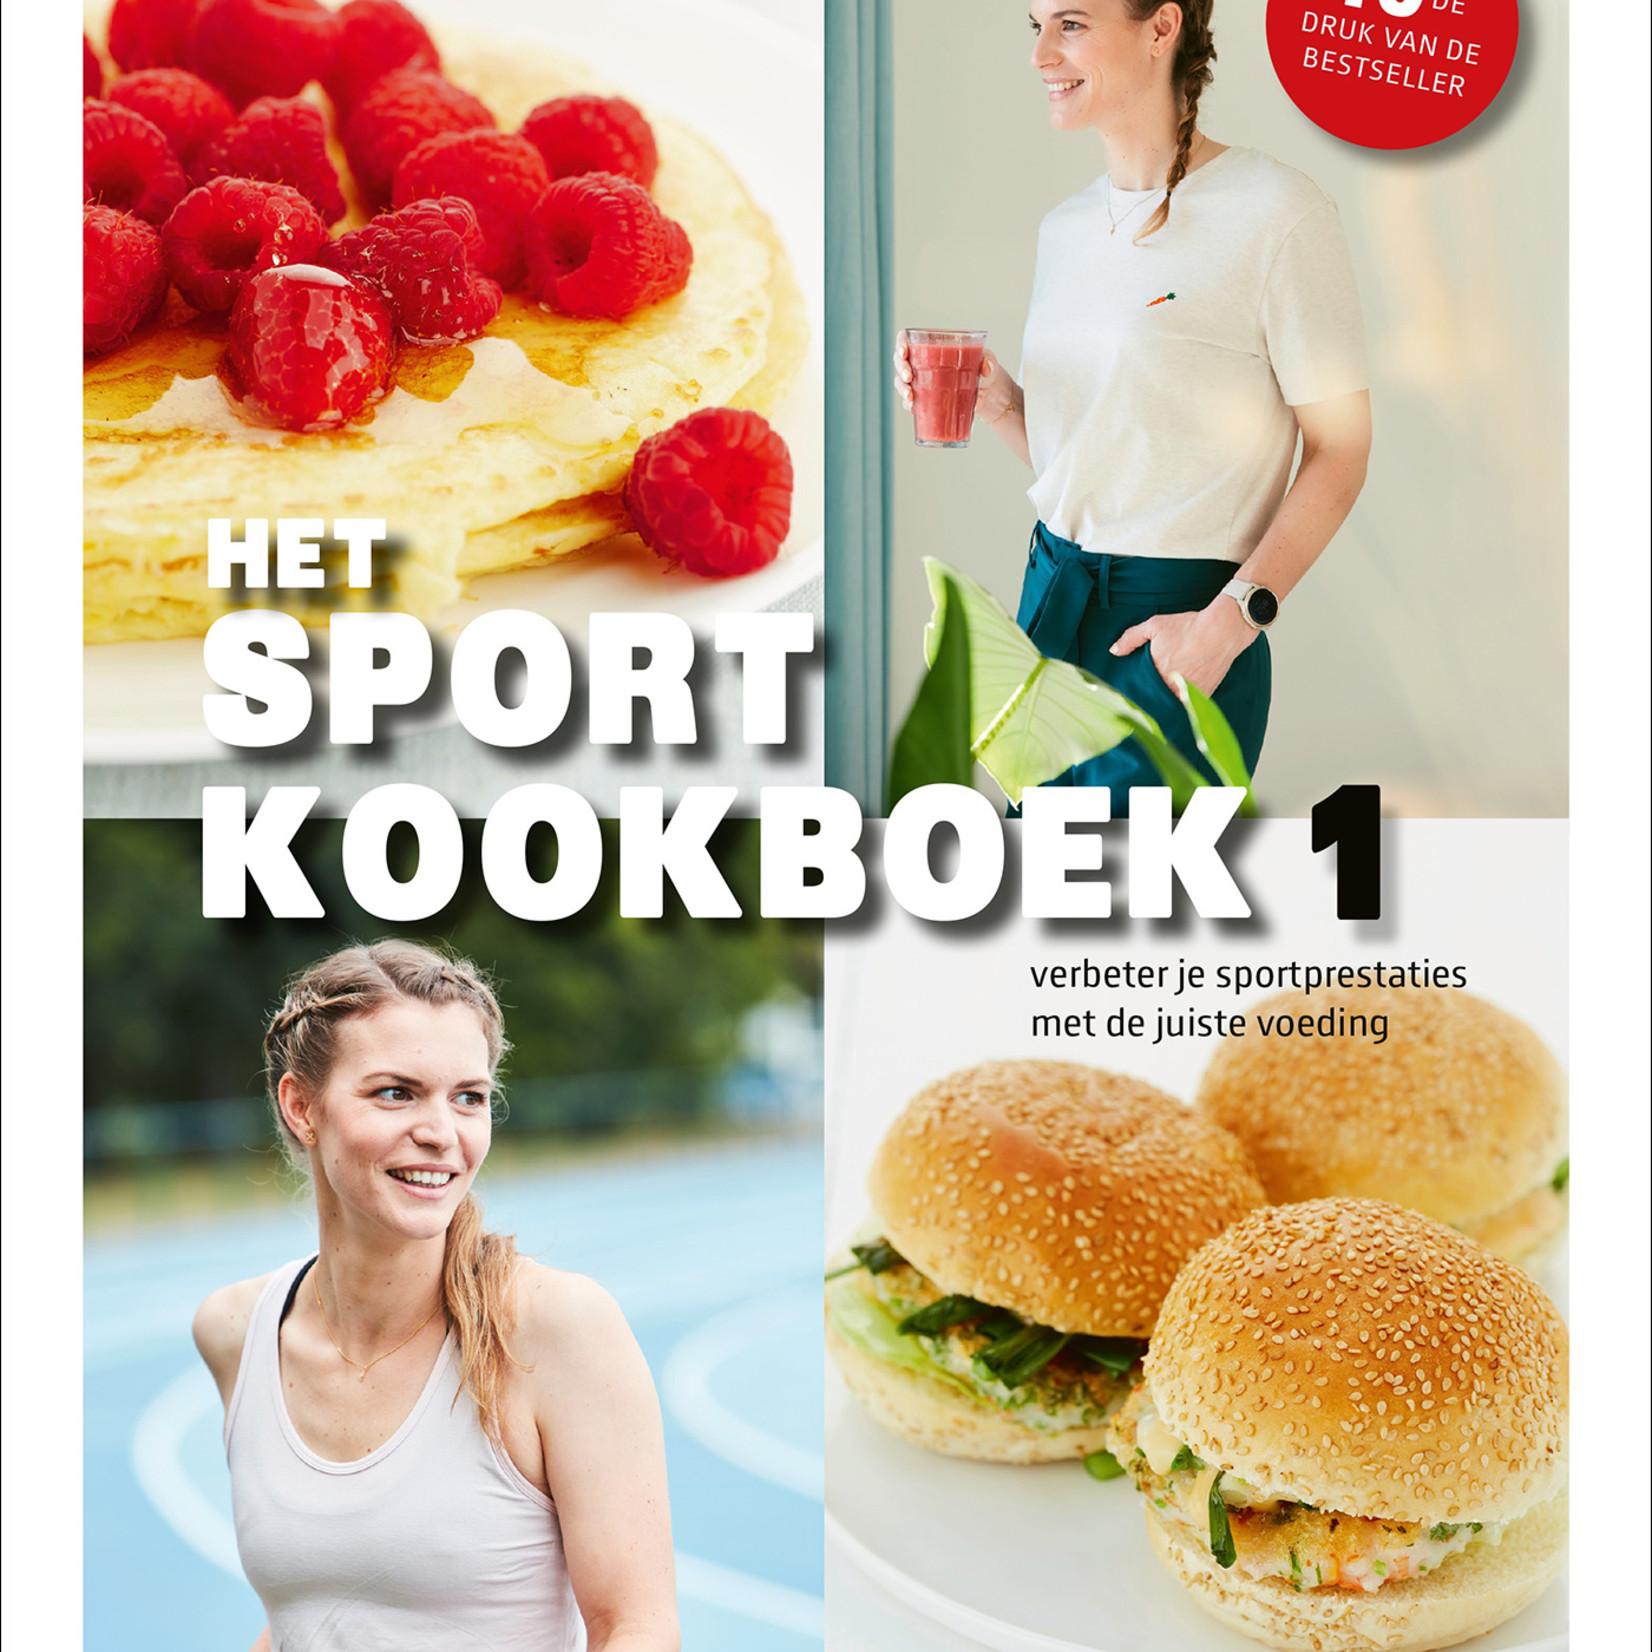 Het Sportkookboek 1, Stephanie Scheirlynck (NED)